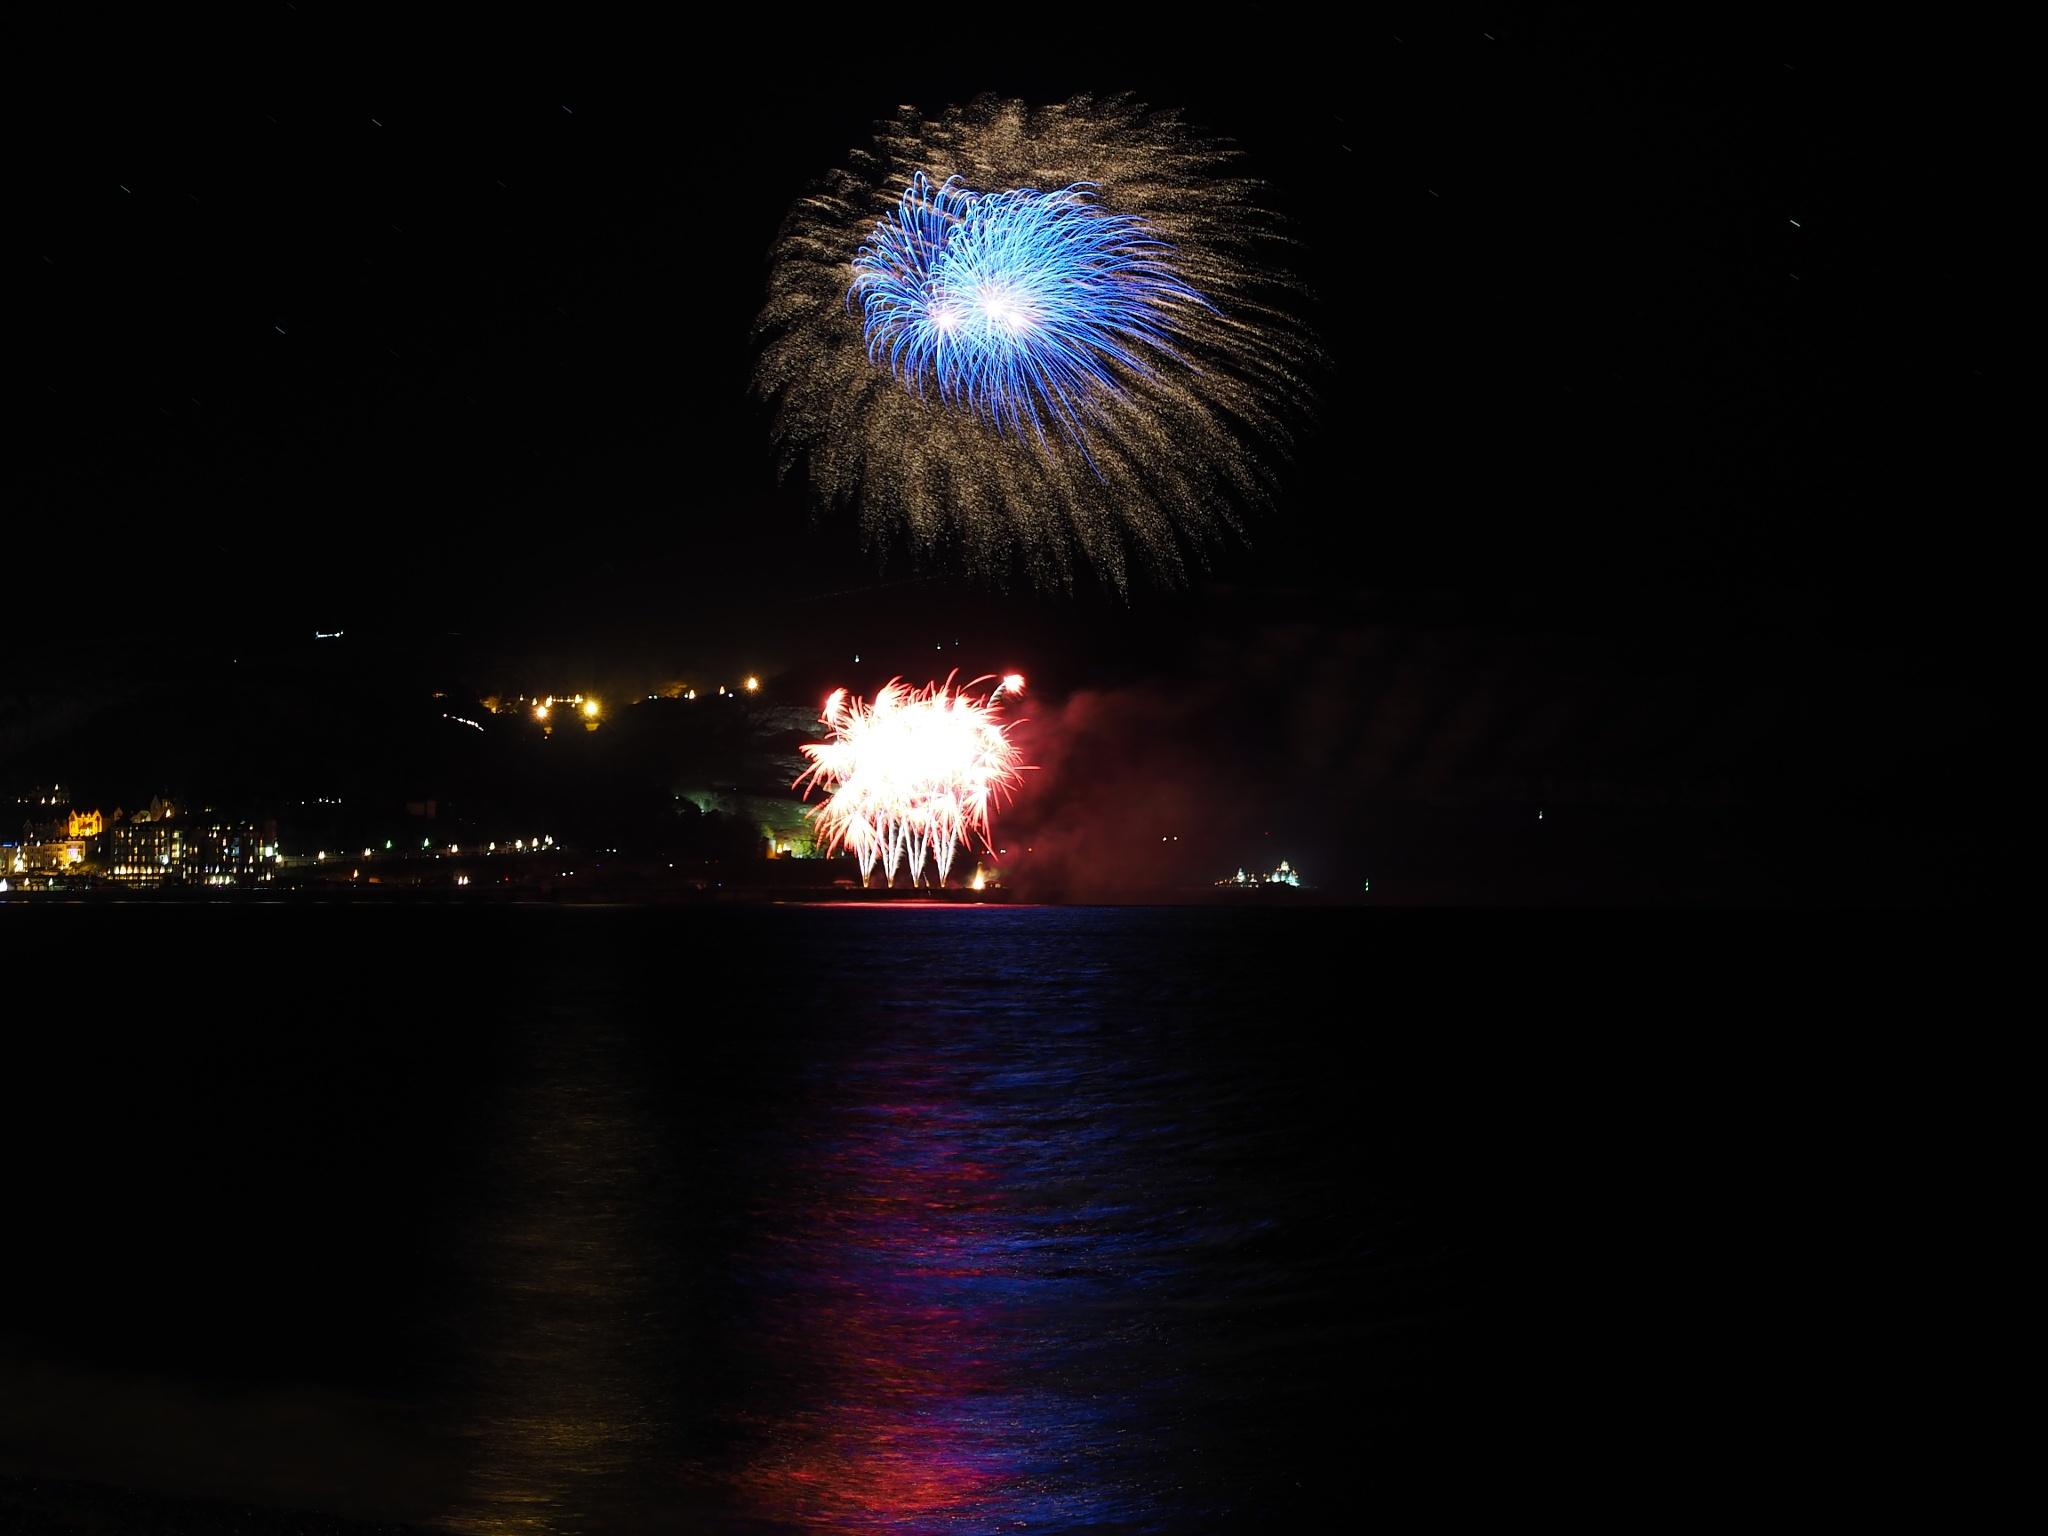 Llandudno Pier Fireworks. by john.bradburn